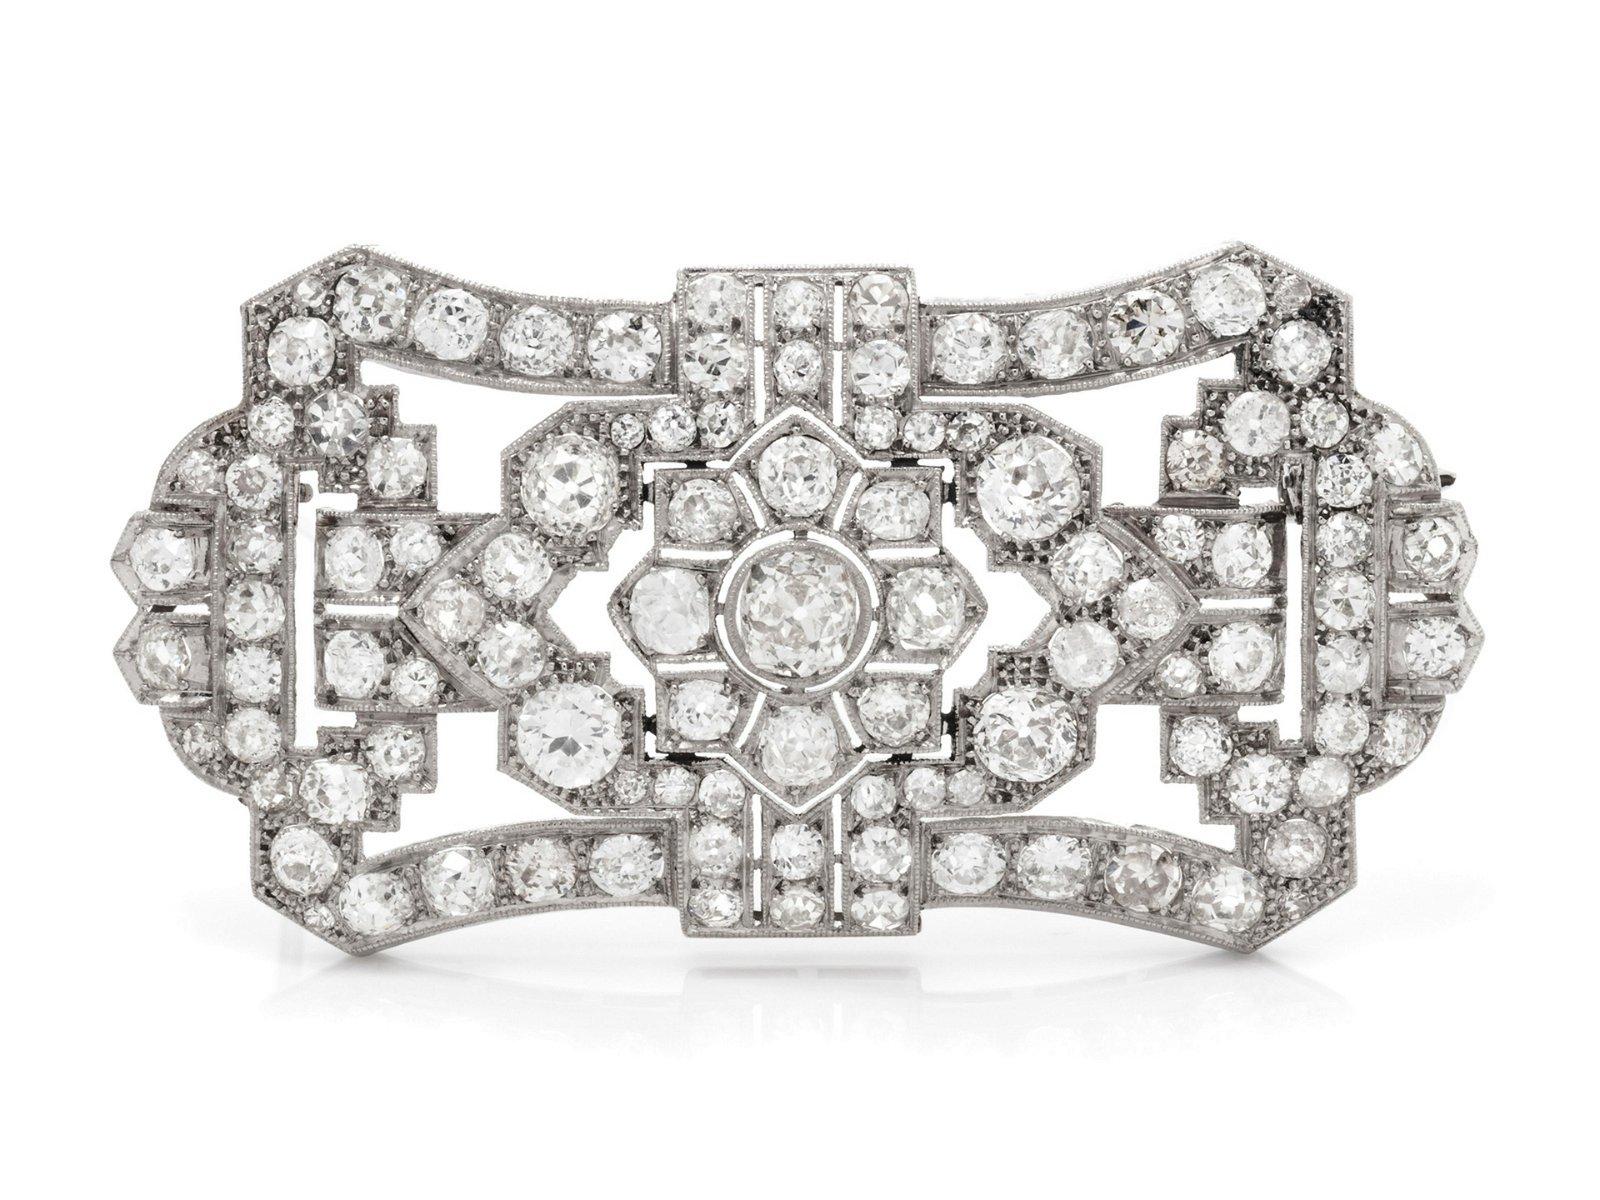 An Art Deco Platinum and Diamond Brooch,